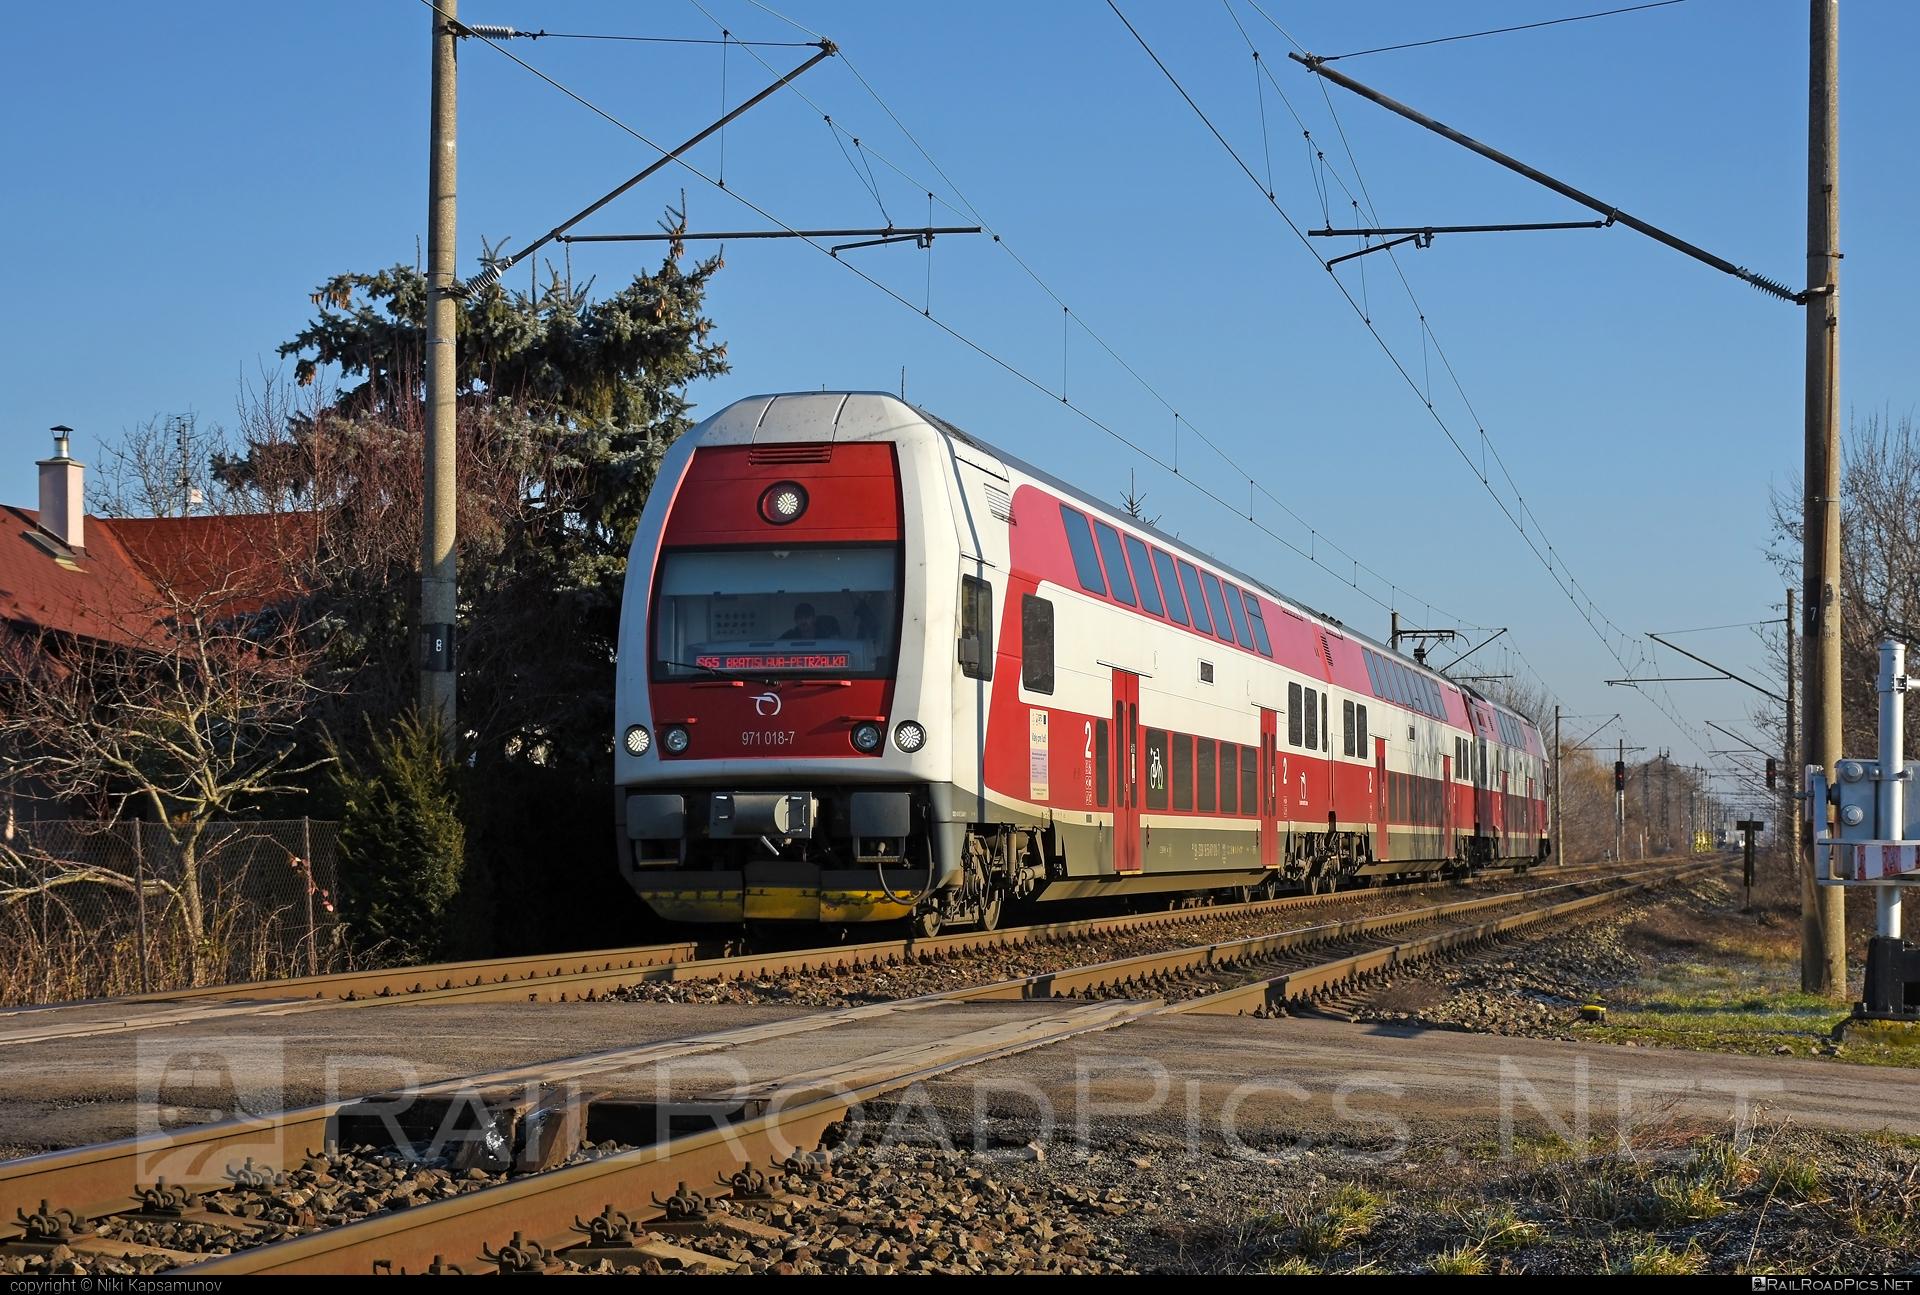 Škoda 4Ev - 971 018-7 operated by Železničná Spoločnost' Slovensko, a.s. #ZeleznicnaSpolocnostSlovensko #emu671 #skoda #skoda4ev #skodaclass671 #zssk